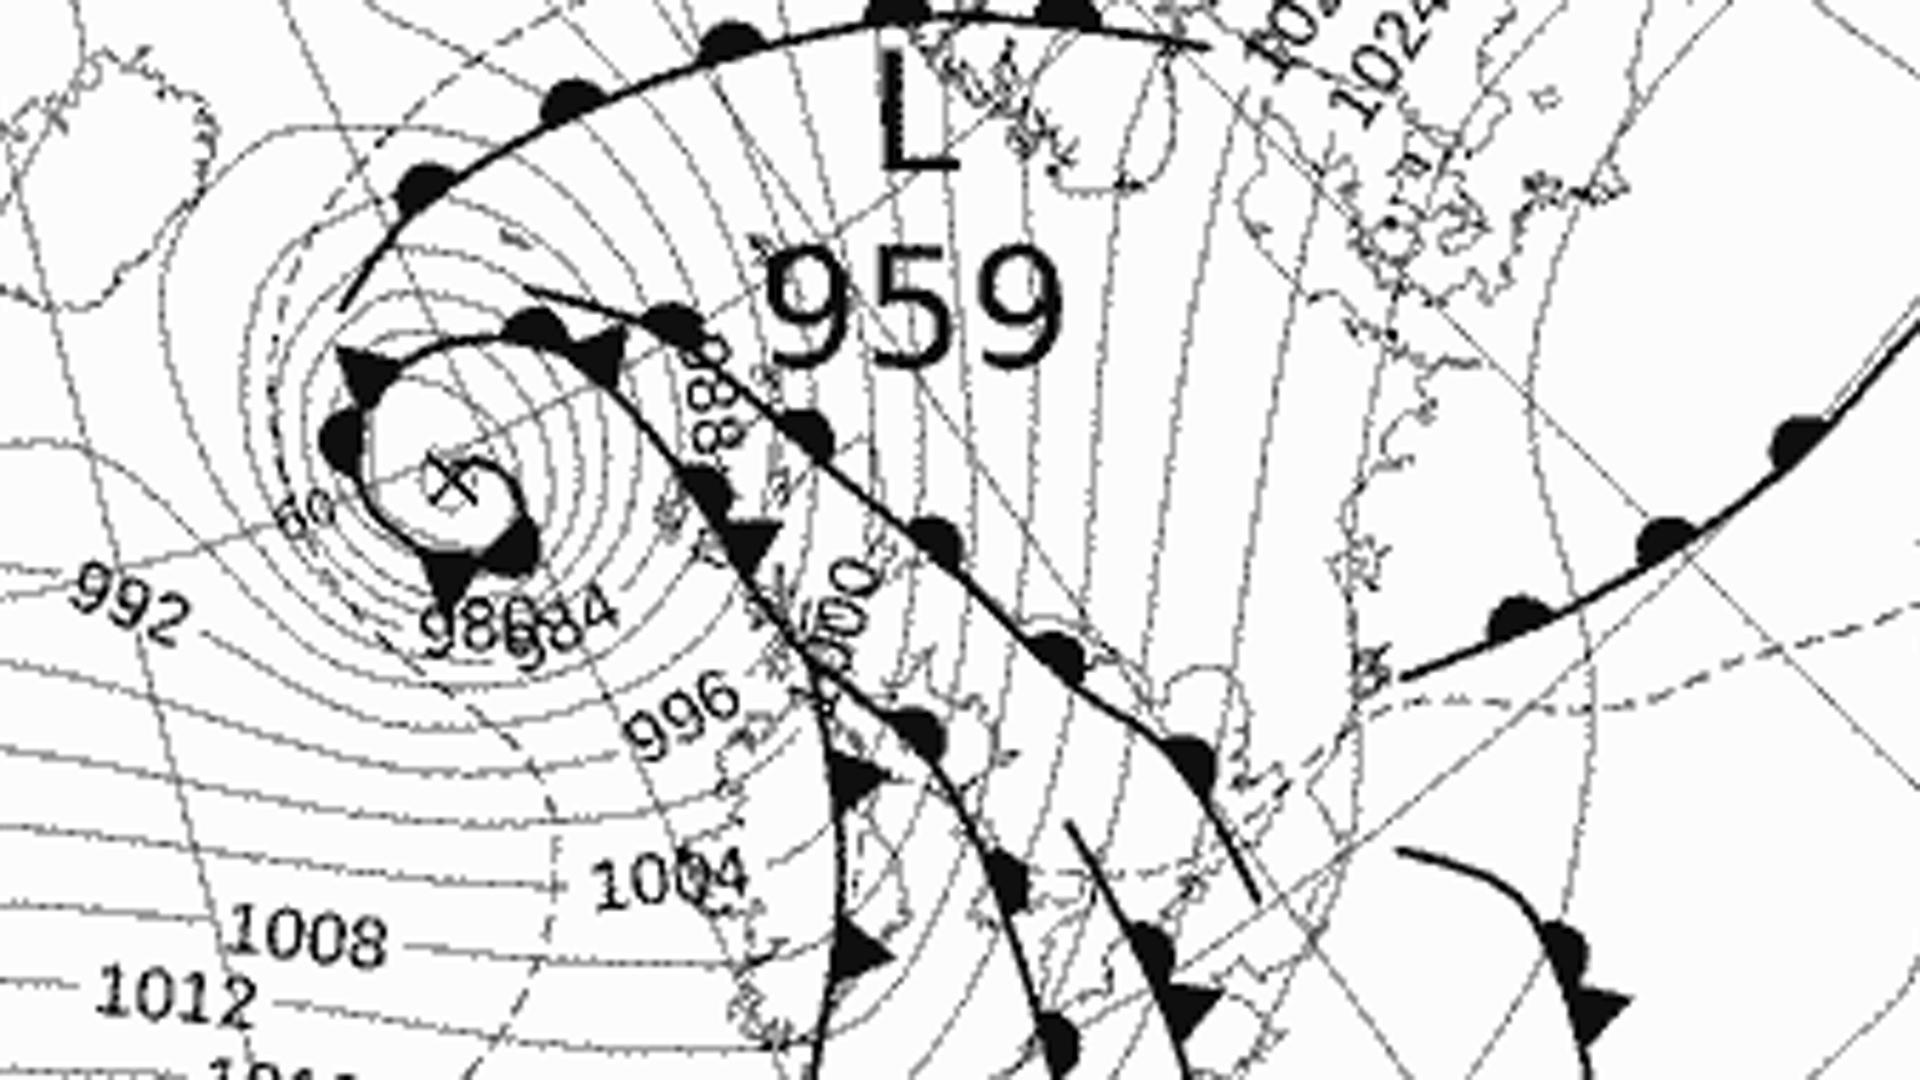 Storm Barbara threatens Christmas travel disruption